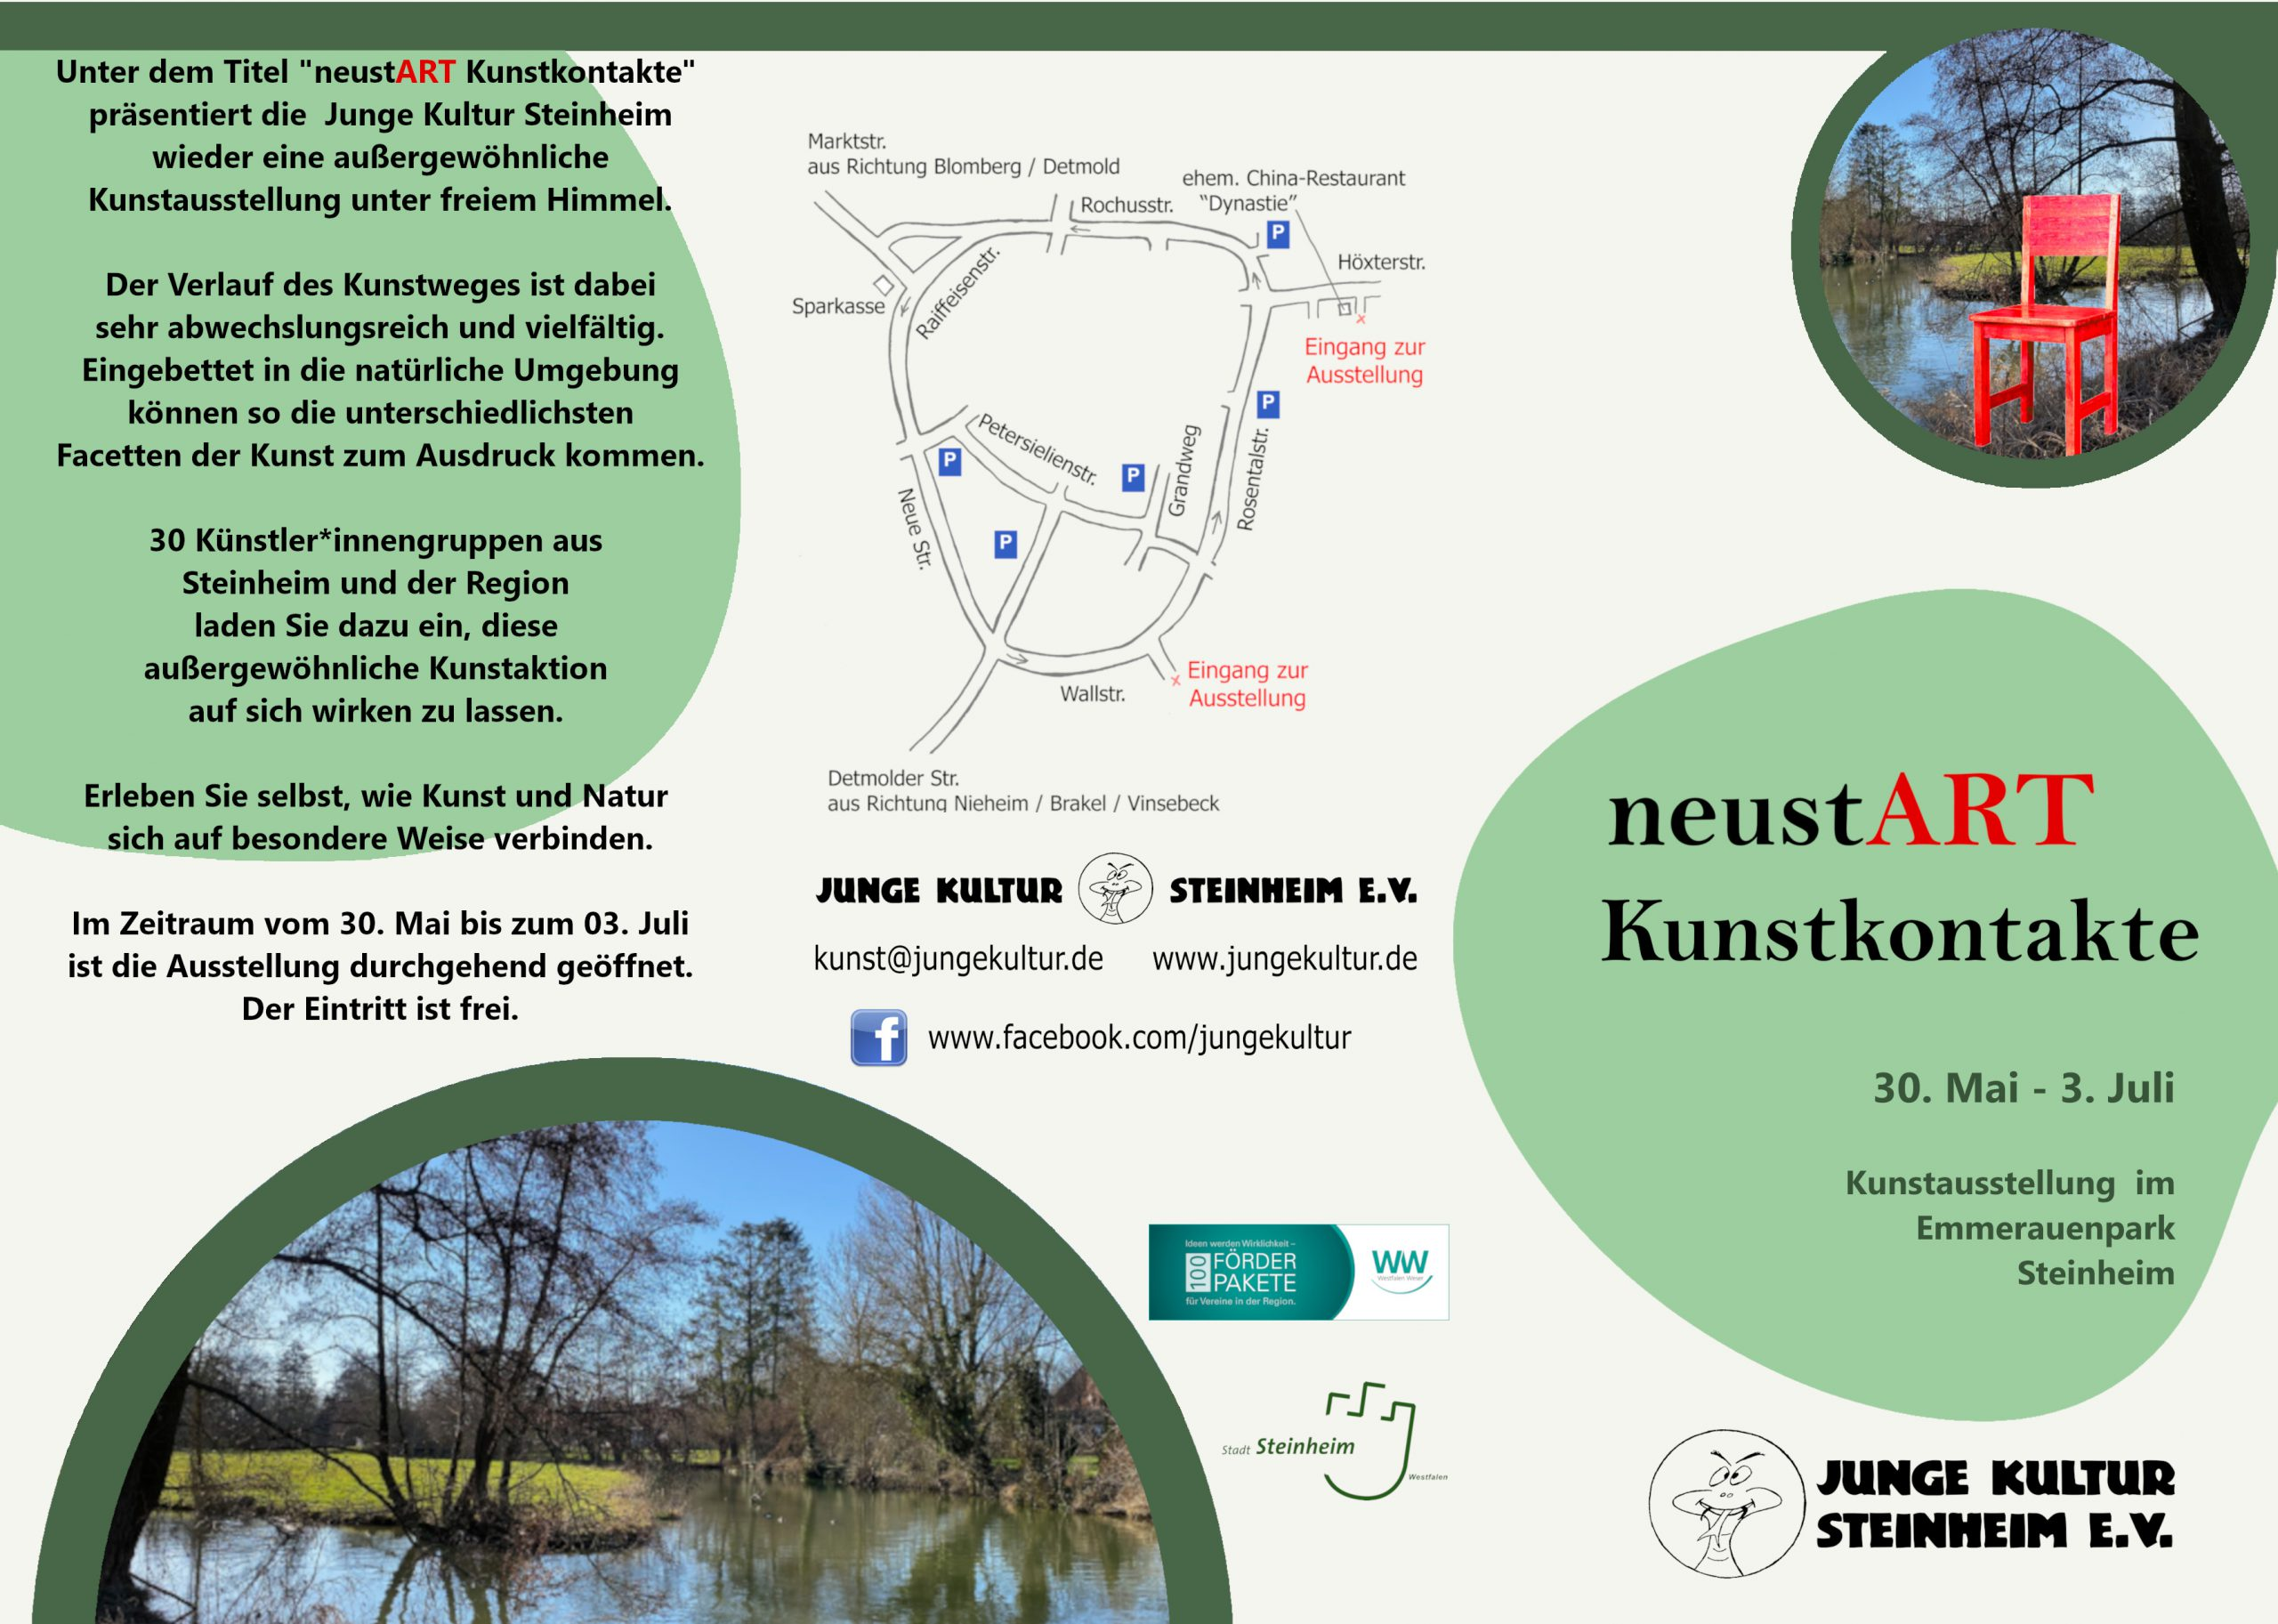 neustART Kunstkontakte 2021 - Flyer außen